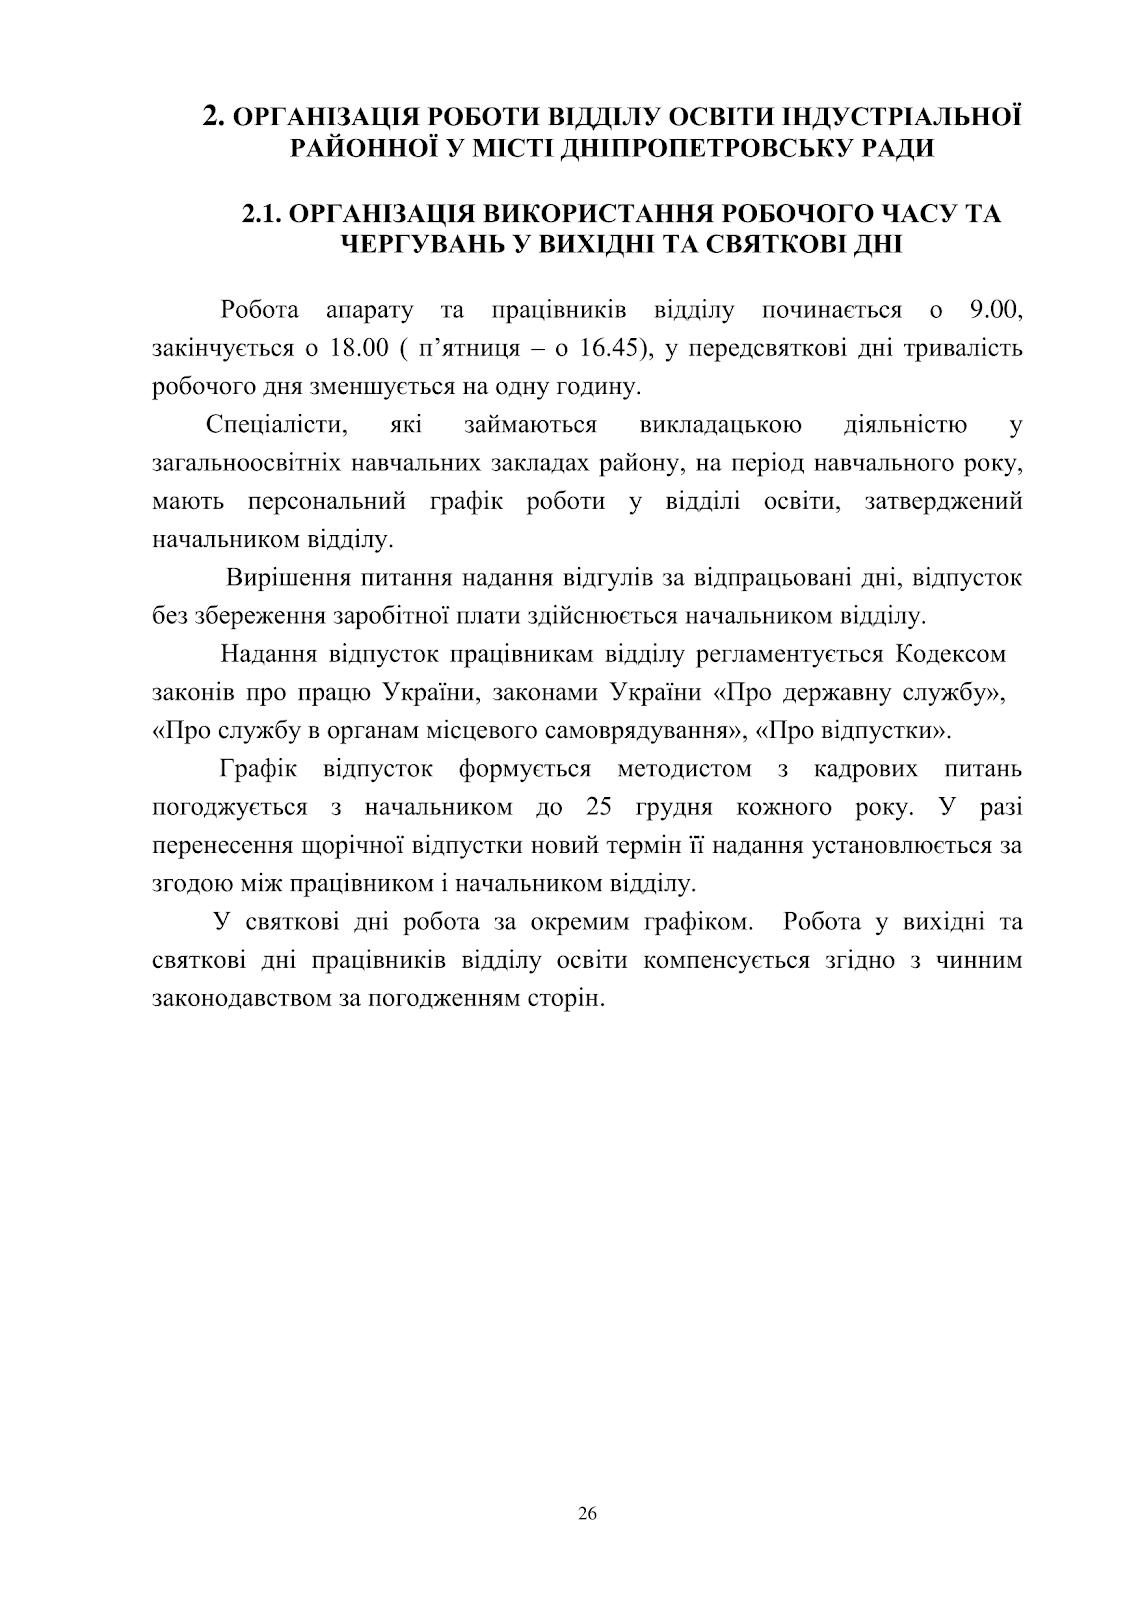 C:\Users\Валерия\Desktop\план 2016 рік\план 2016 рік-026.png